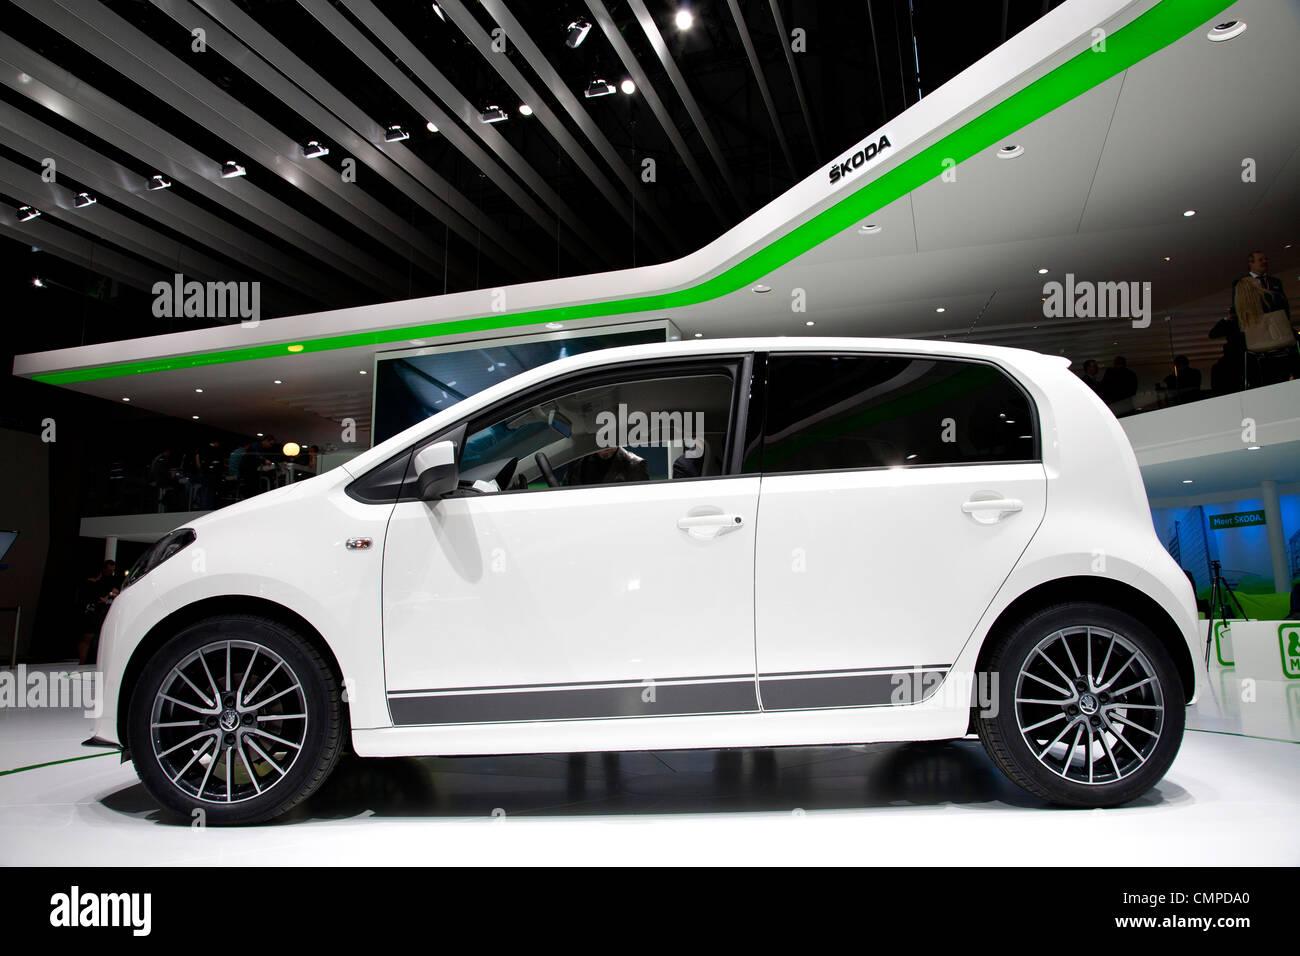 Skoda Citigo at the Geneva Motor Show 2012 - Stock Image